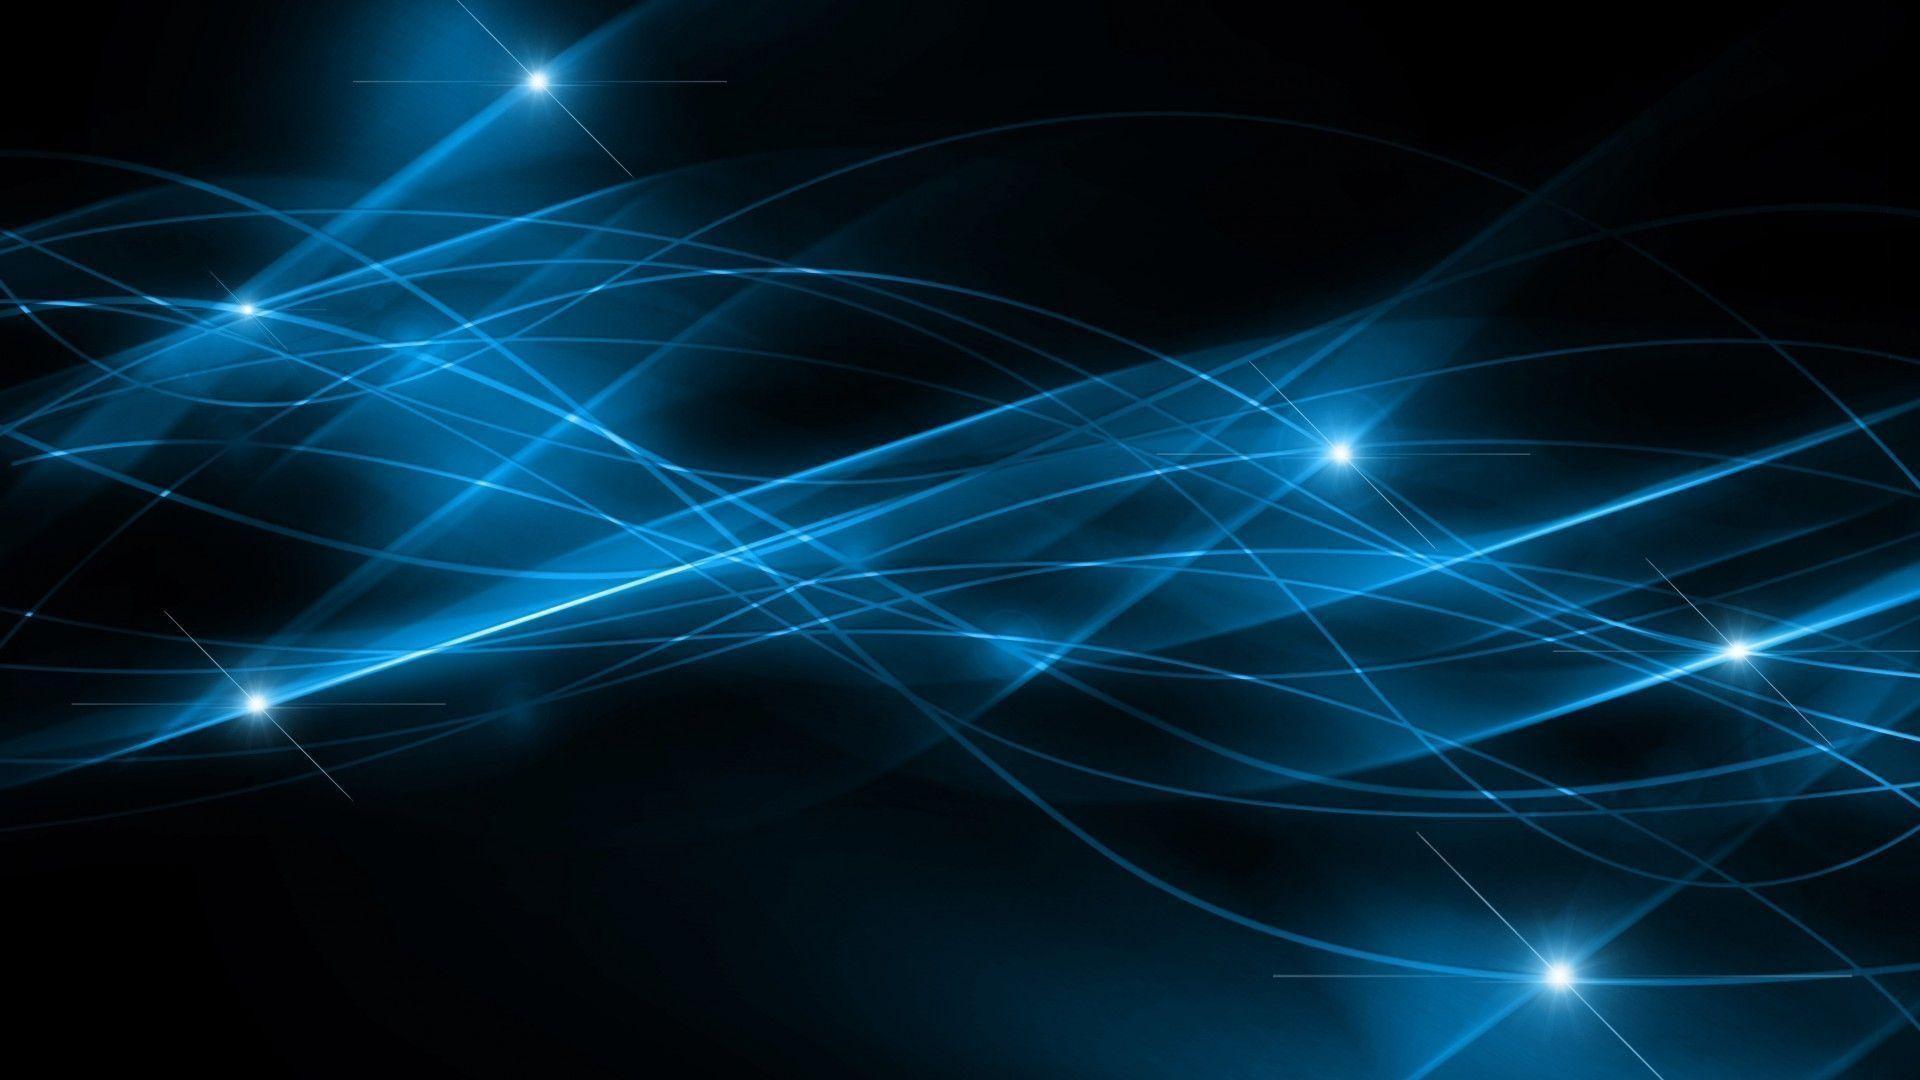 2560x1600 Desktop Abstract Wallpapers Blue Dowload